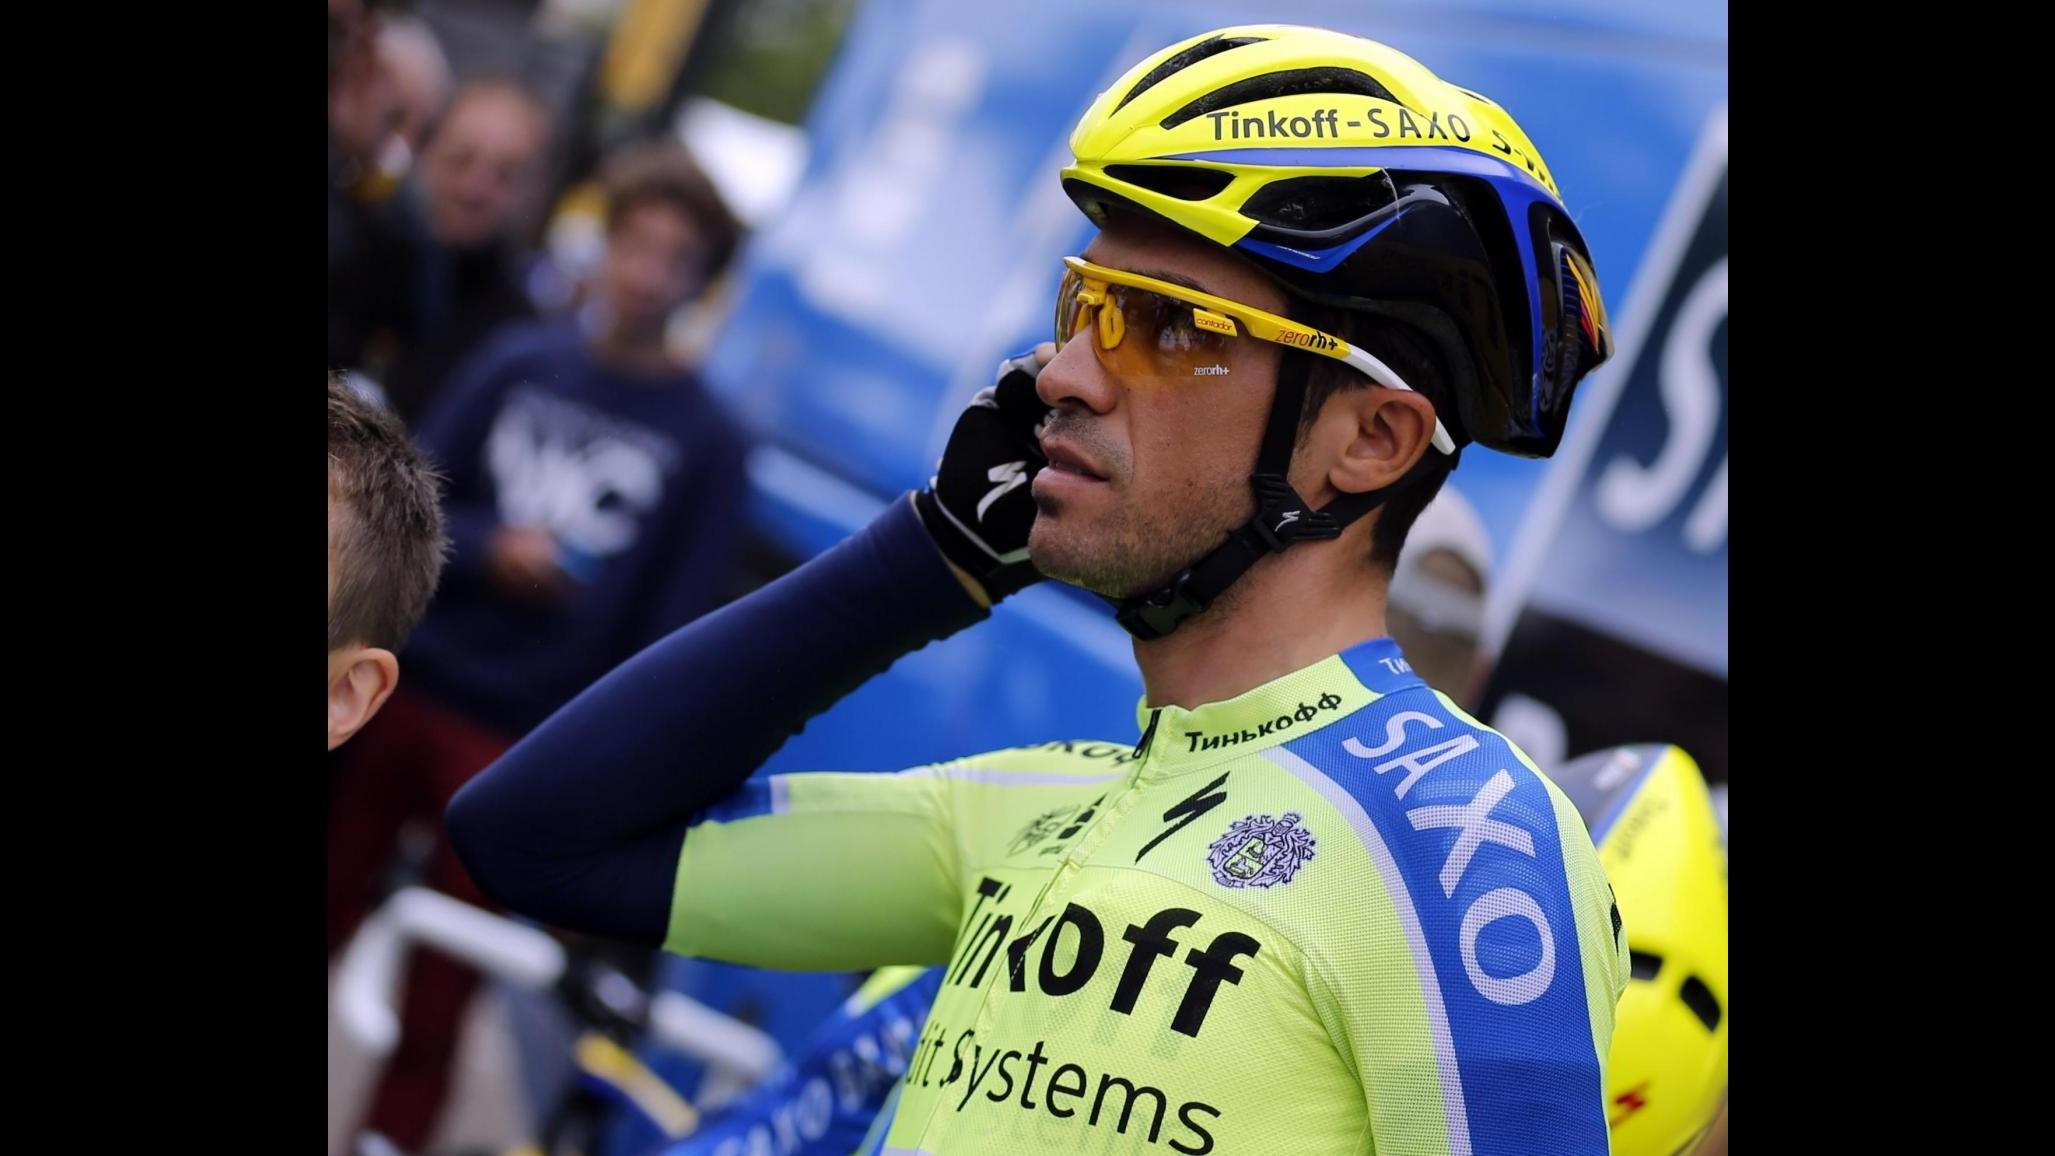 Ciclismo, Contador recupera: parteciperà alla Vuelta di Spagna